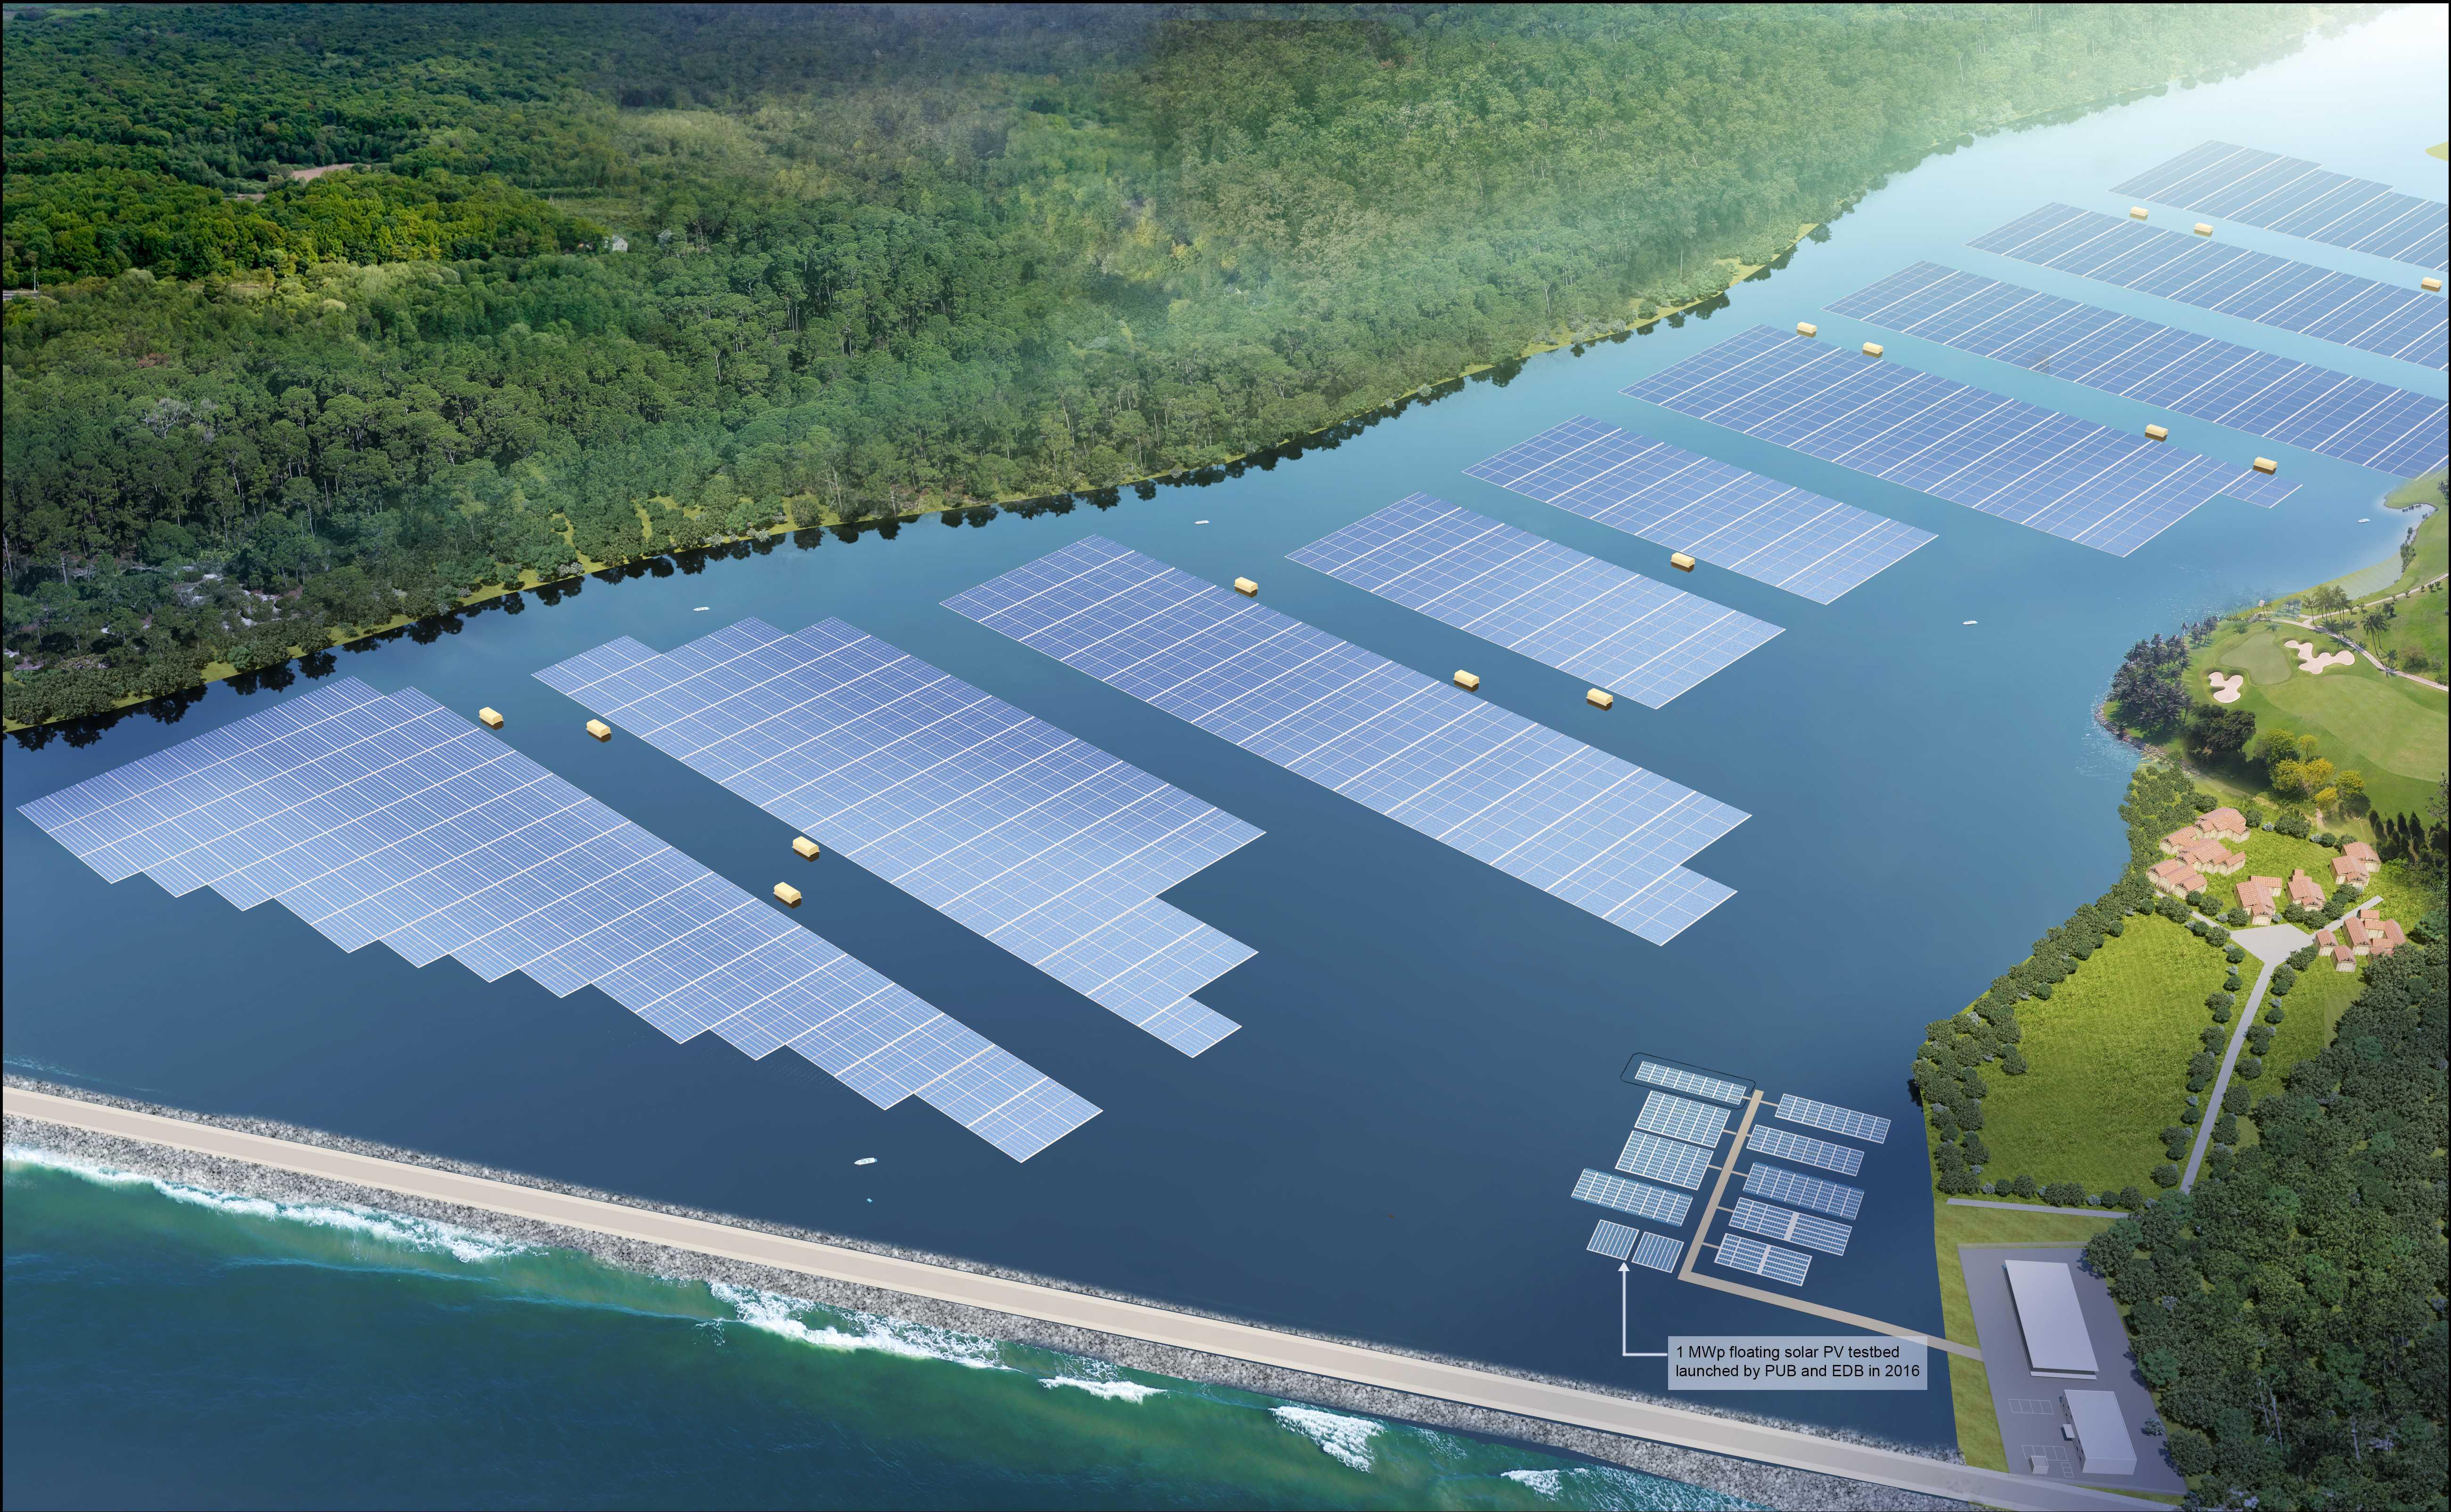 Solpaneler på vatten kan bli uppemot elva procent mer effektivt. Foto: Sembcorp